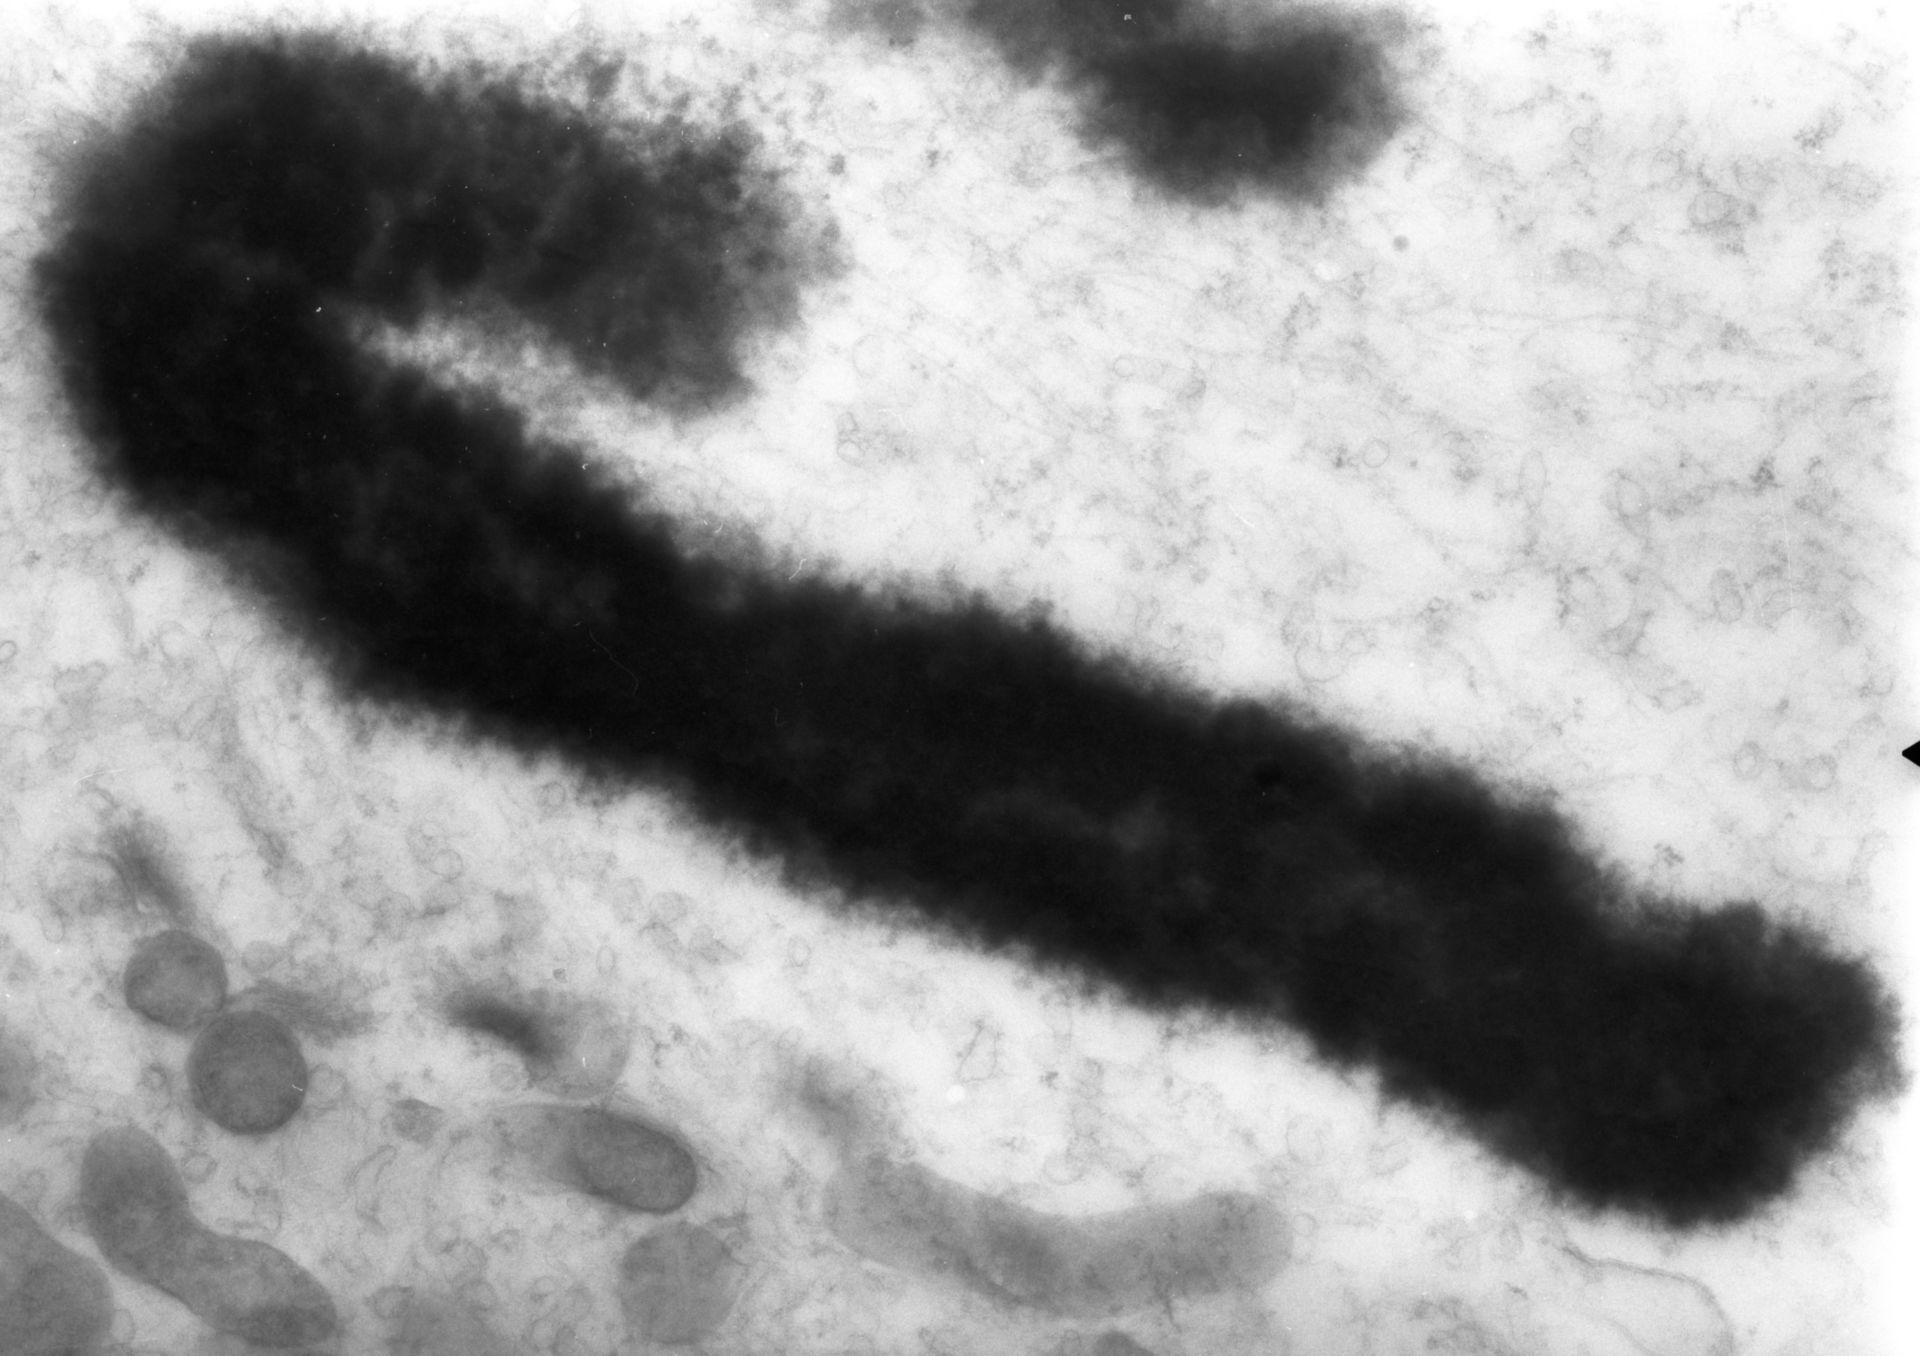 Haemanthus katharinae (Nuclear chromosome) - CIL:11913